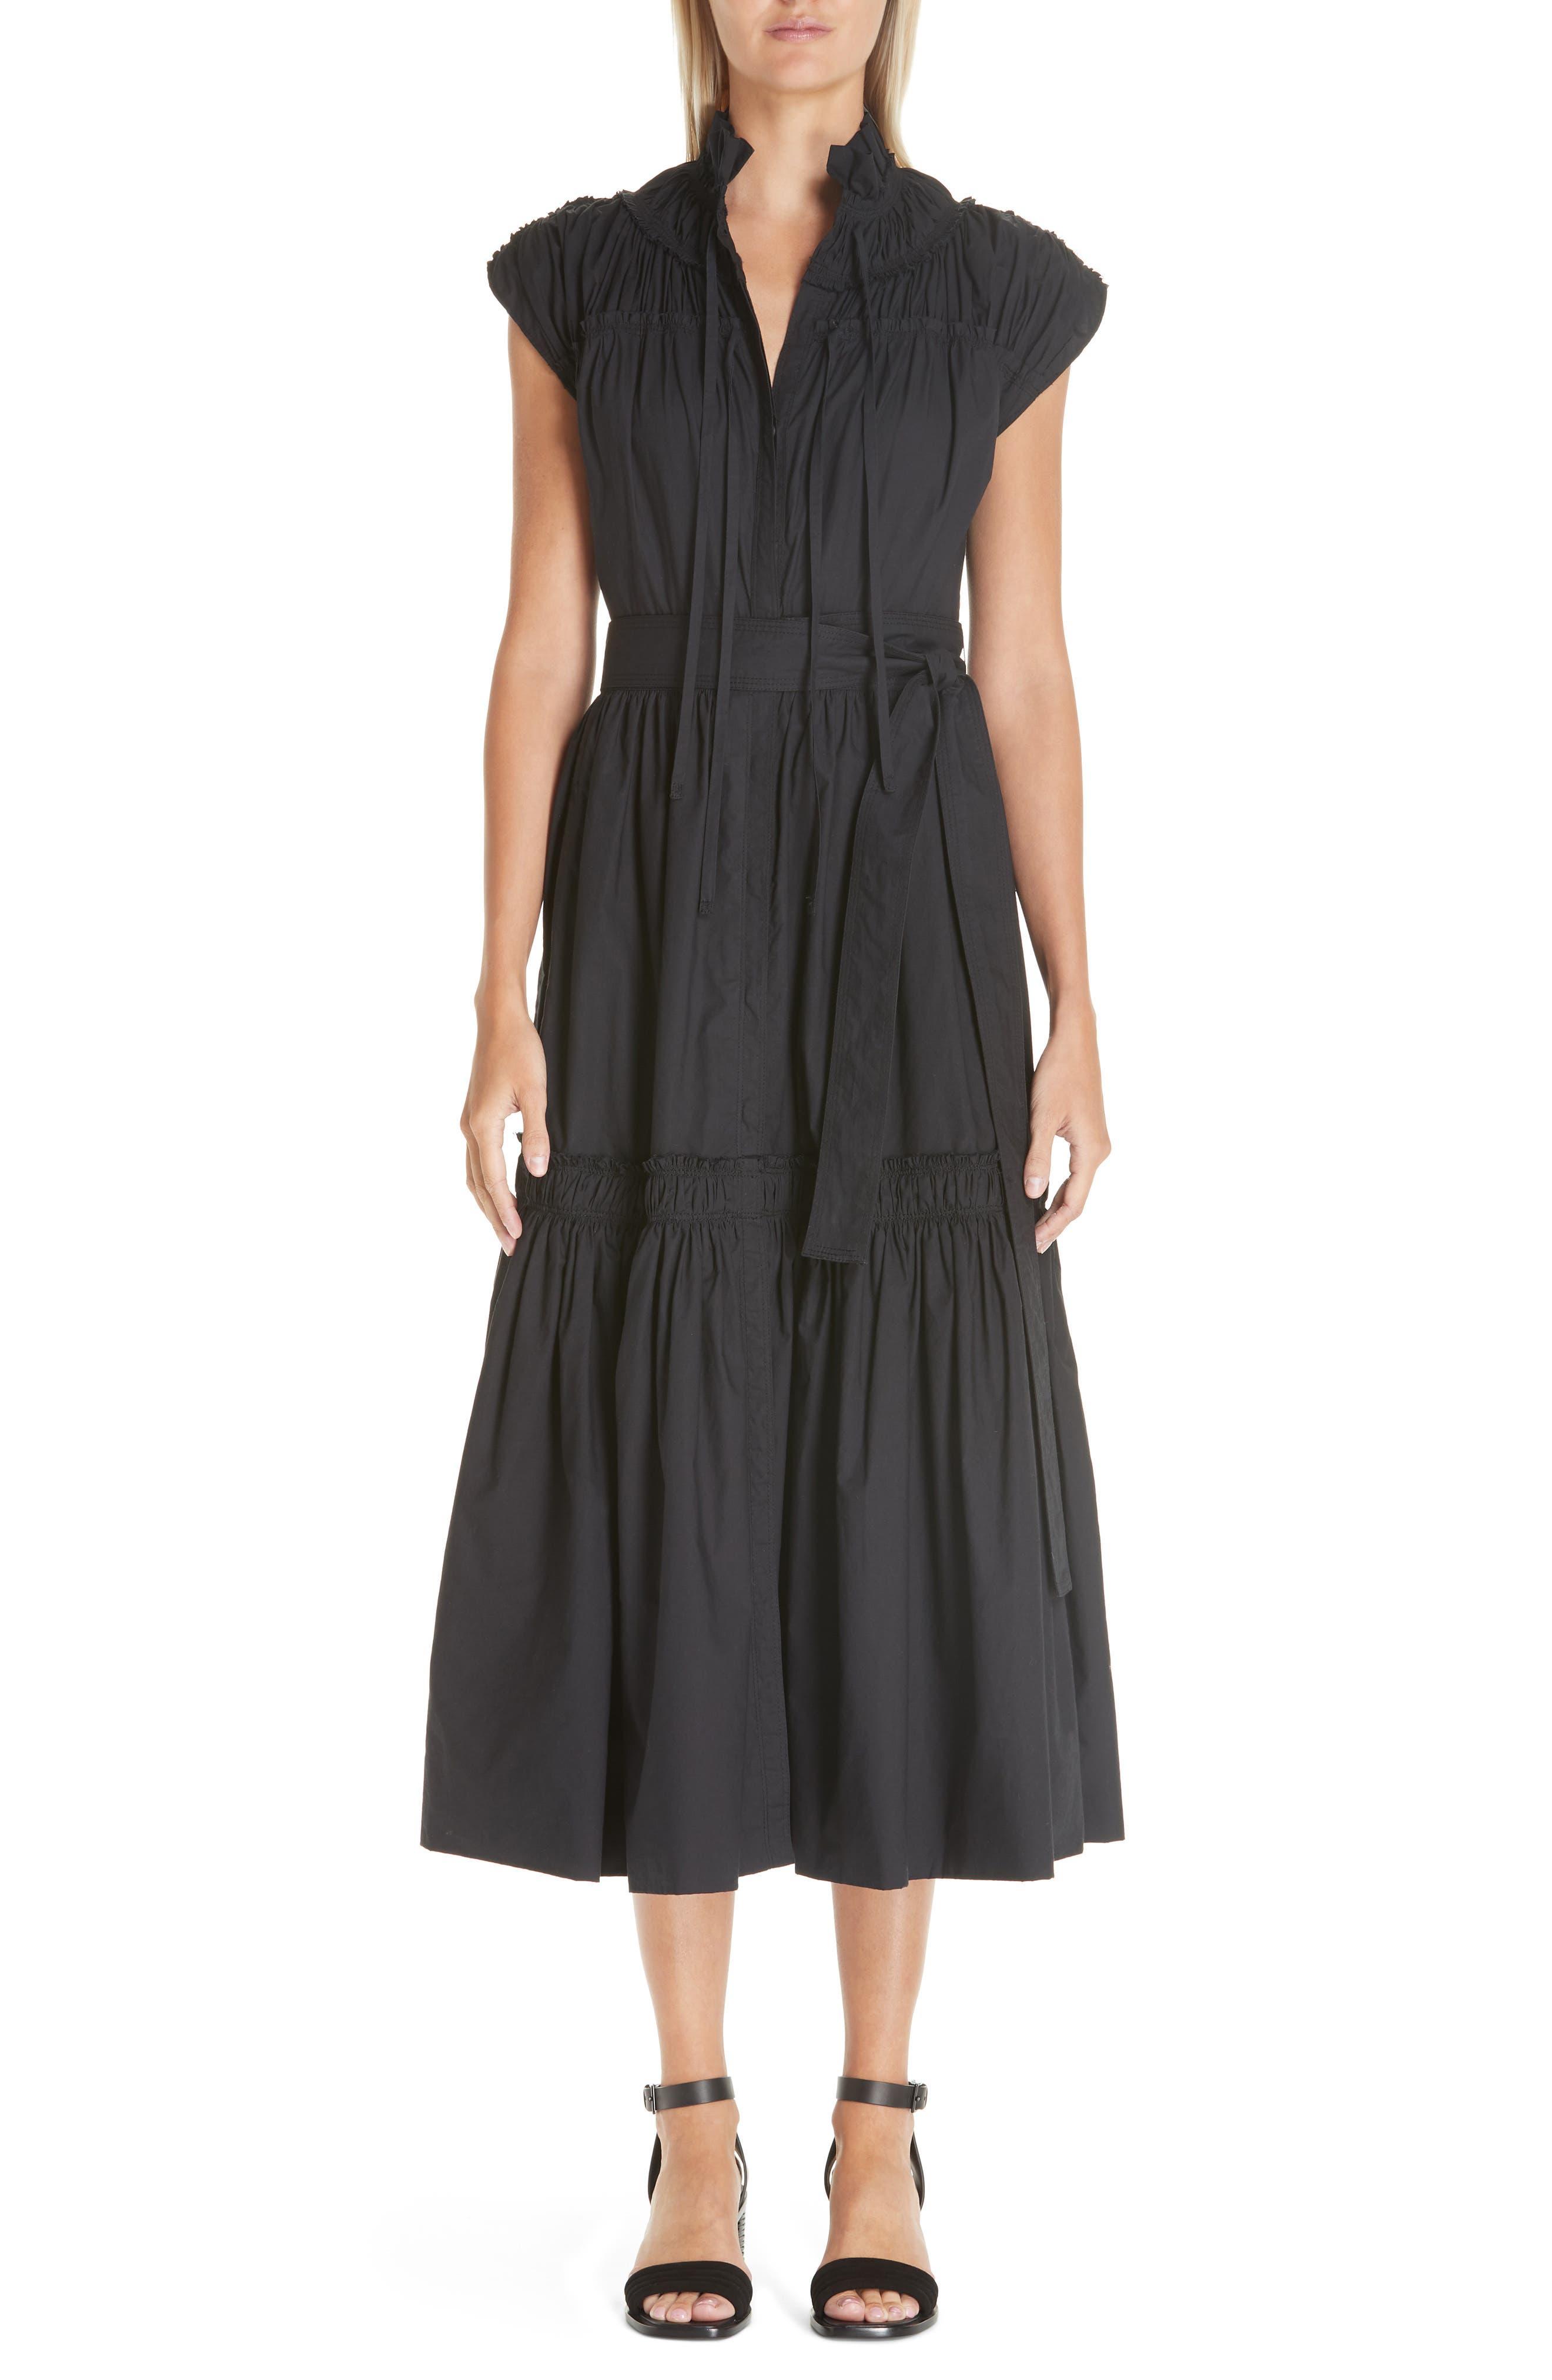 PROENZA SCHOULER Smocked Poplin Dress, Main, color, BLACK